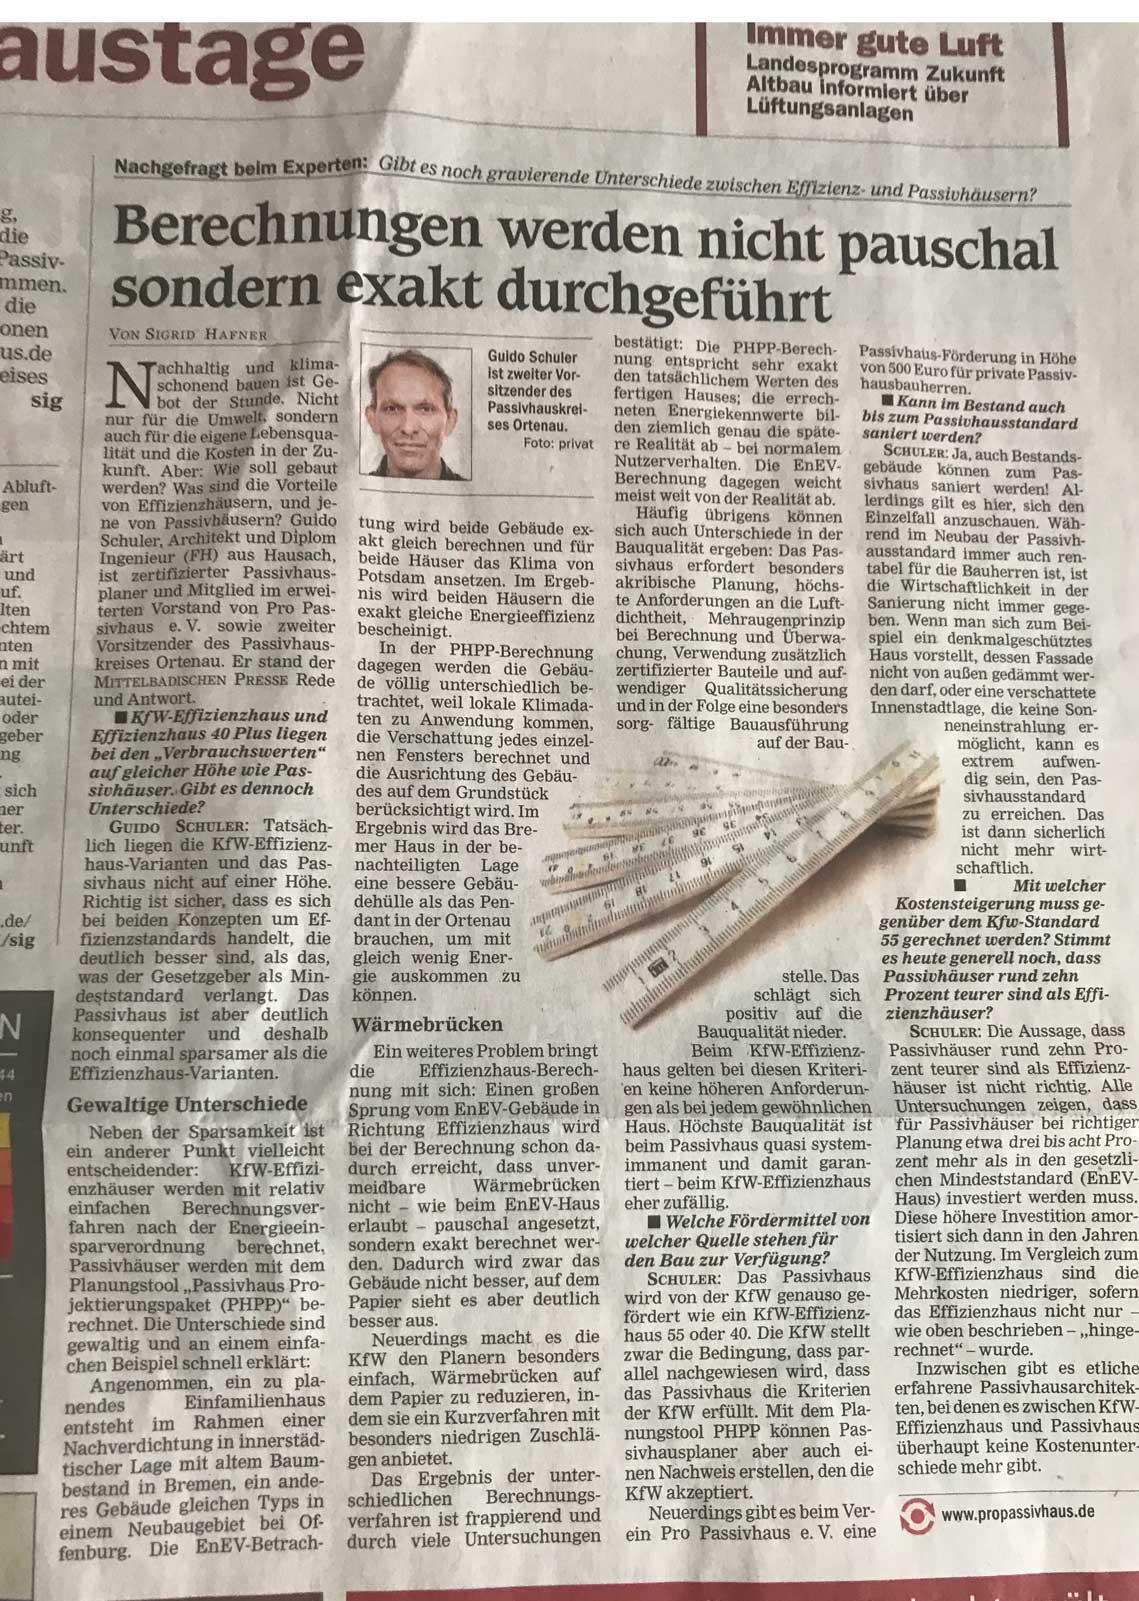 Passivhaus vs Effizienzhaus – Offenburger Tageblatt